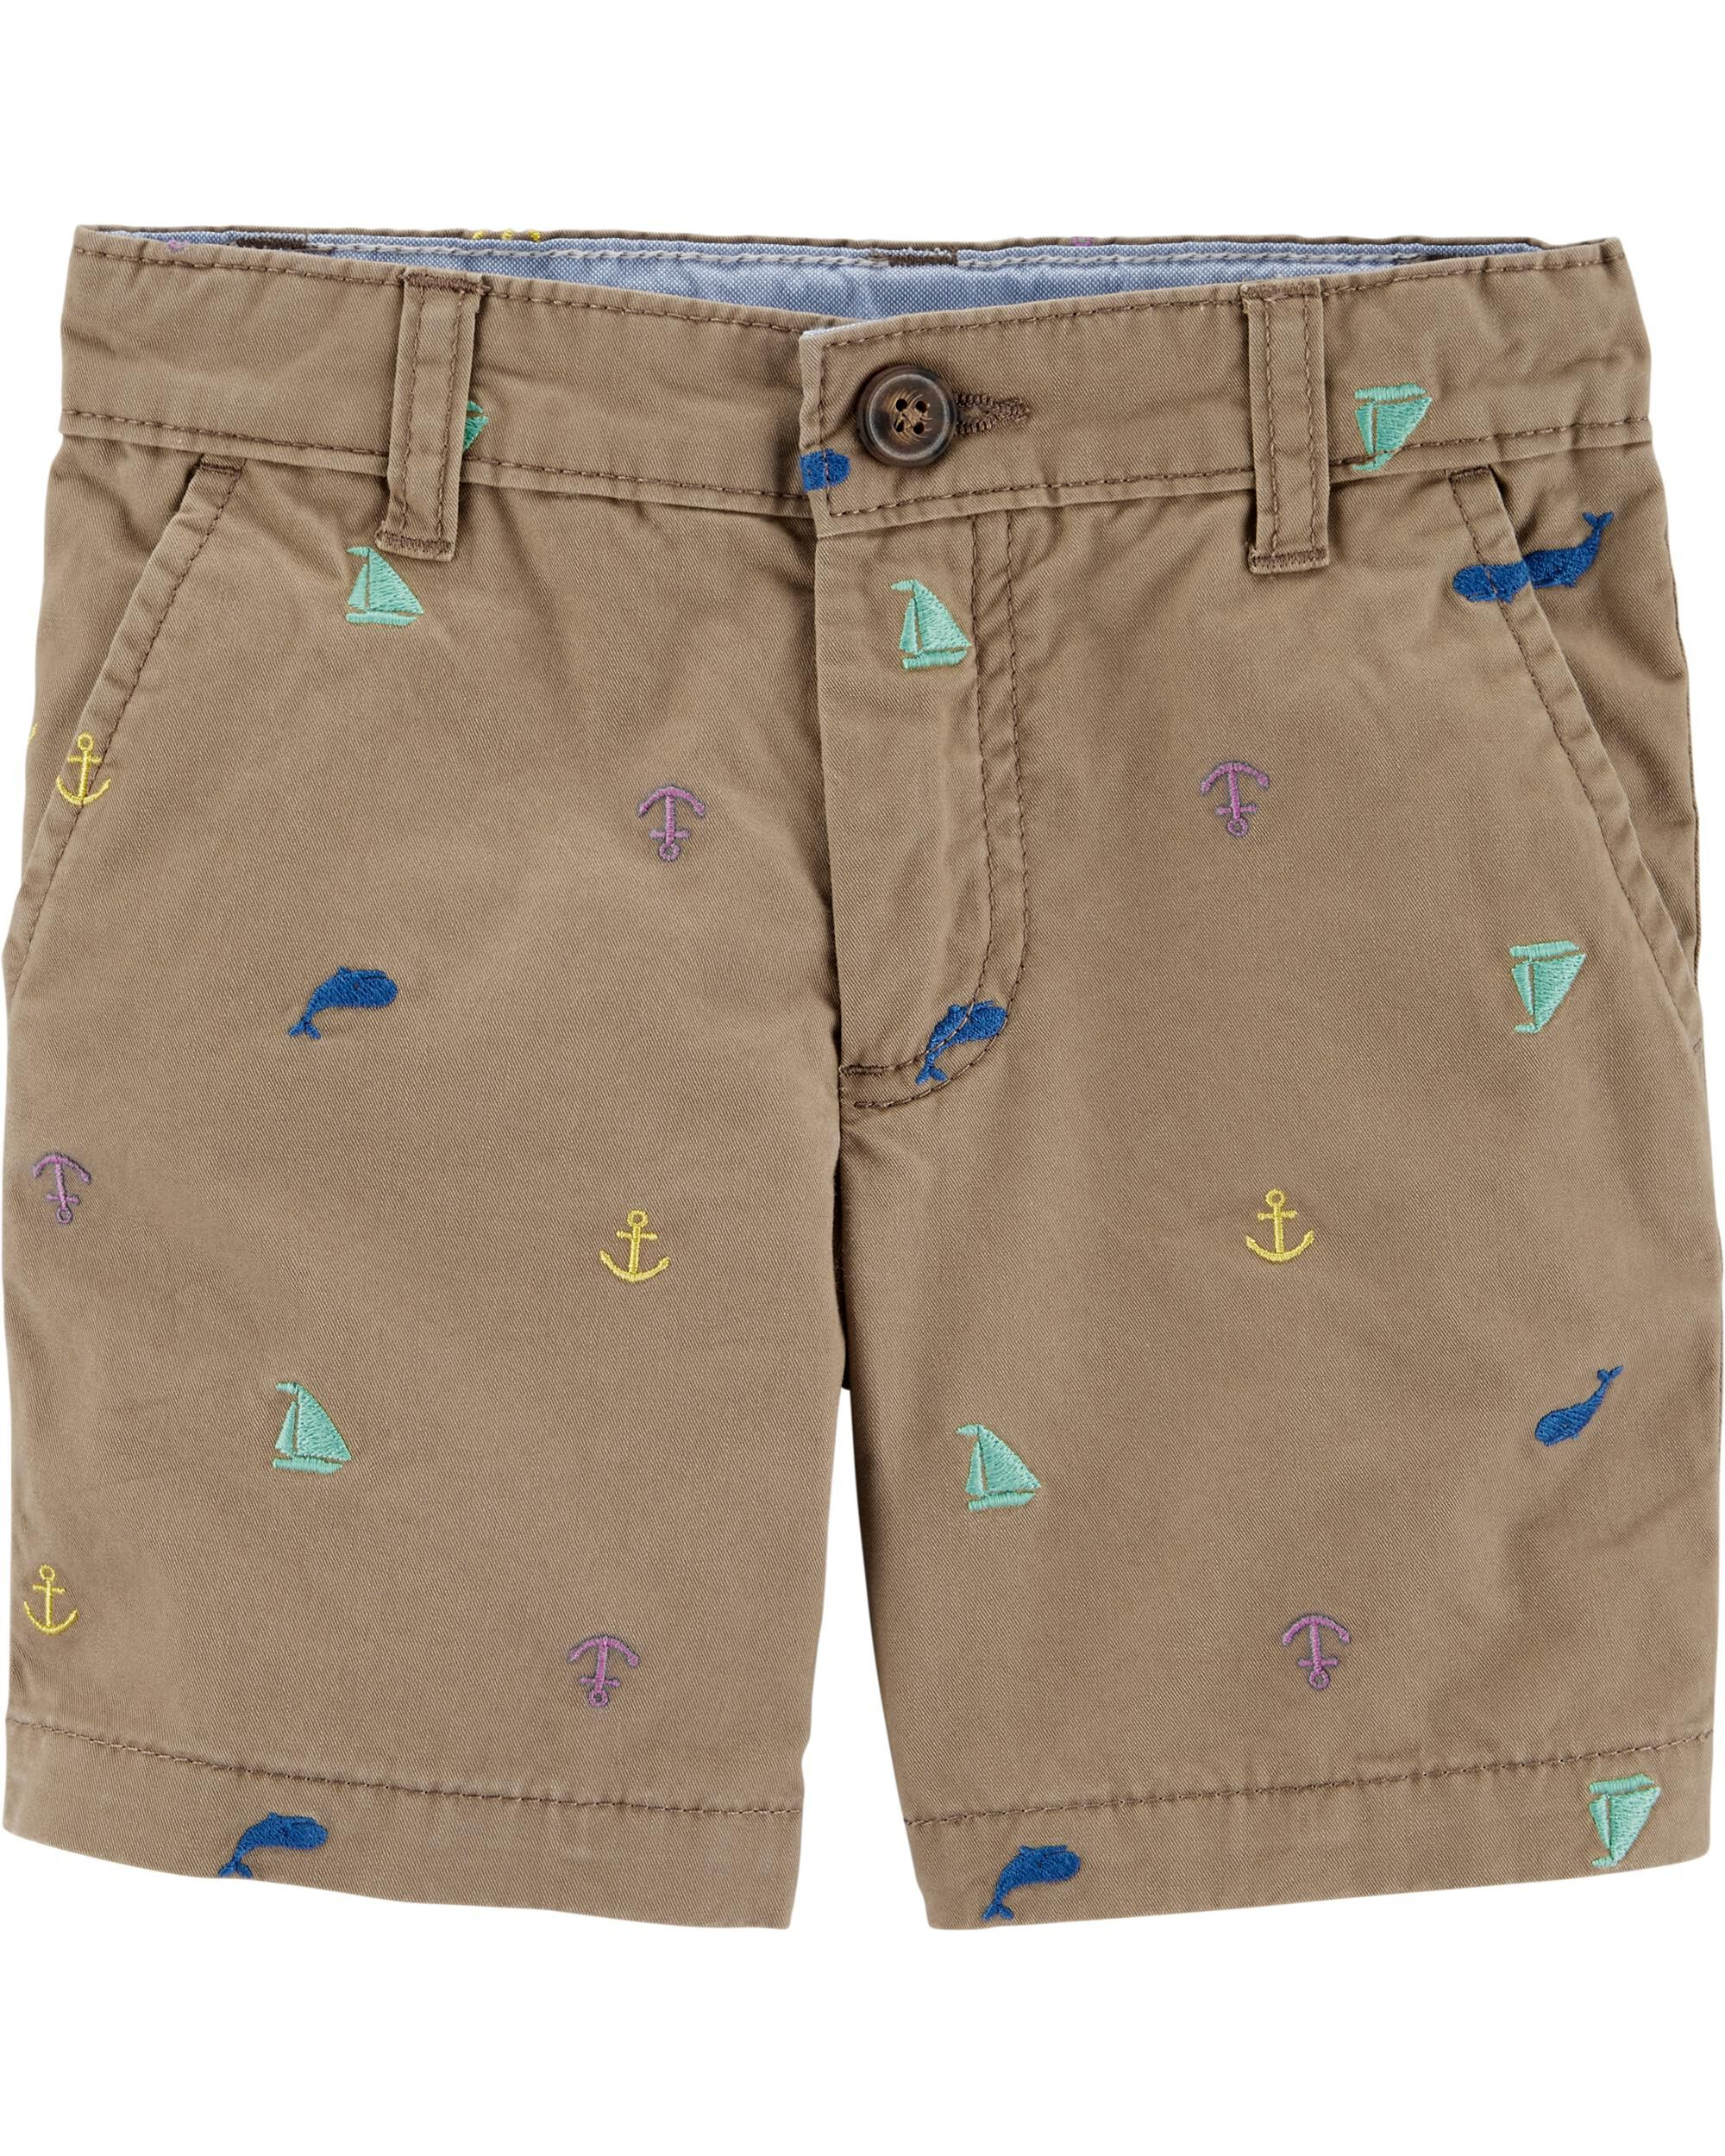 *CLEARANCE* Schiffli Flat-Front Shorts